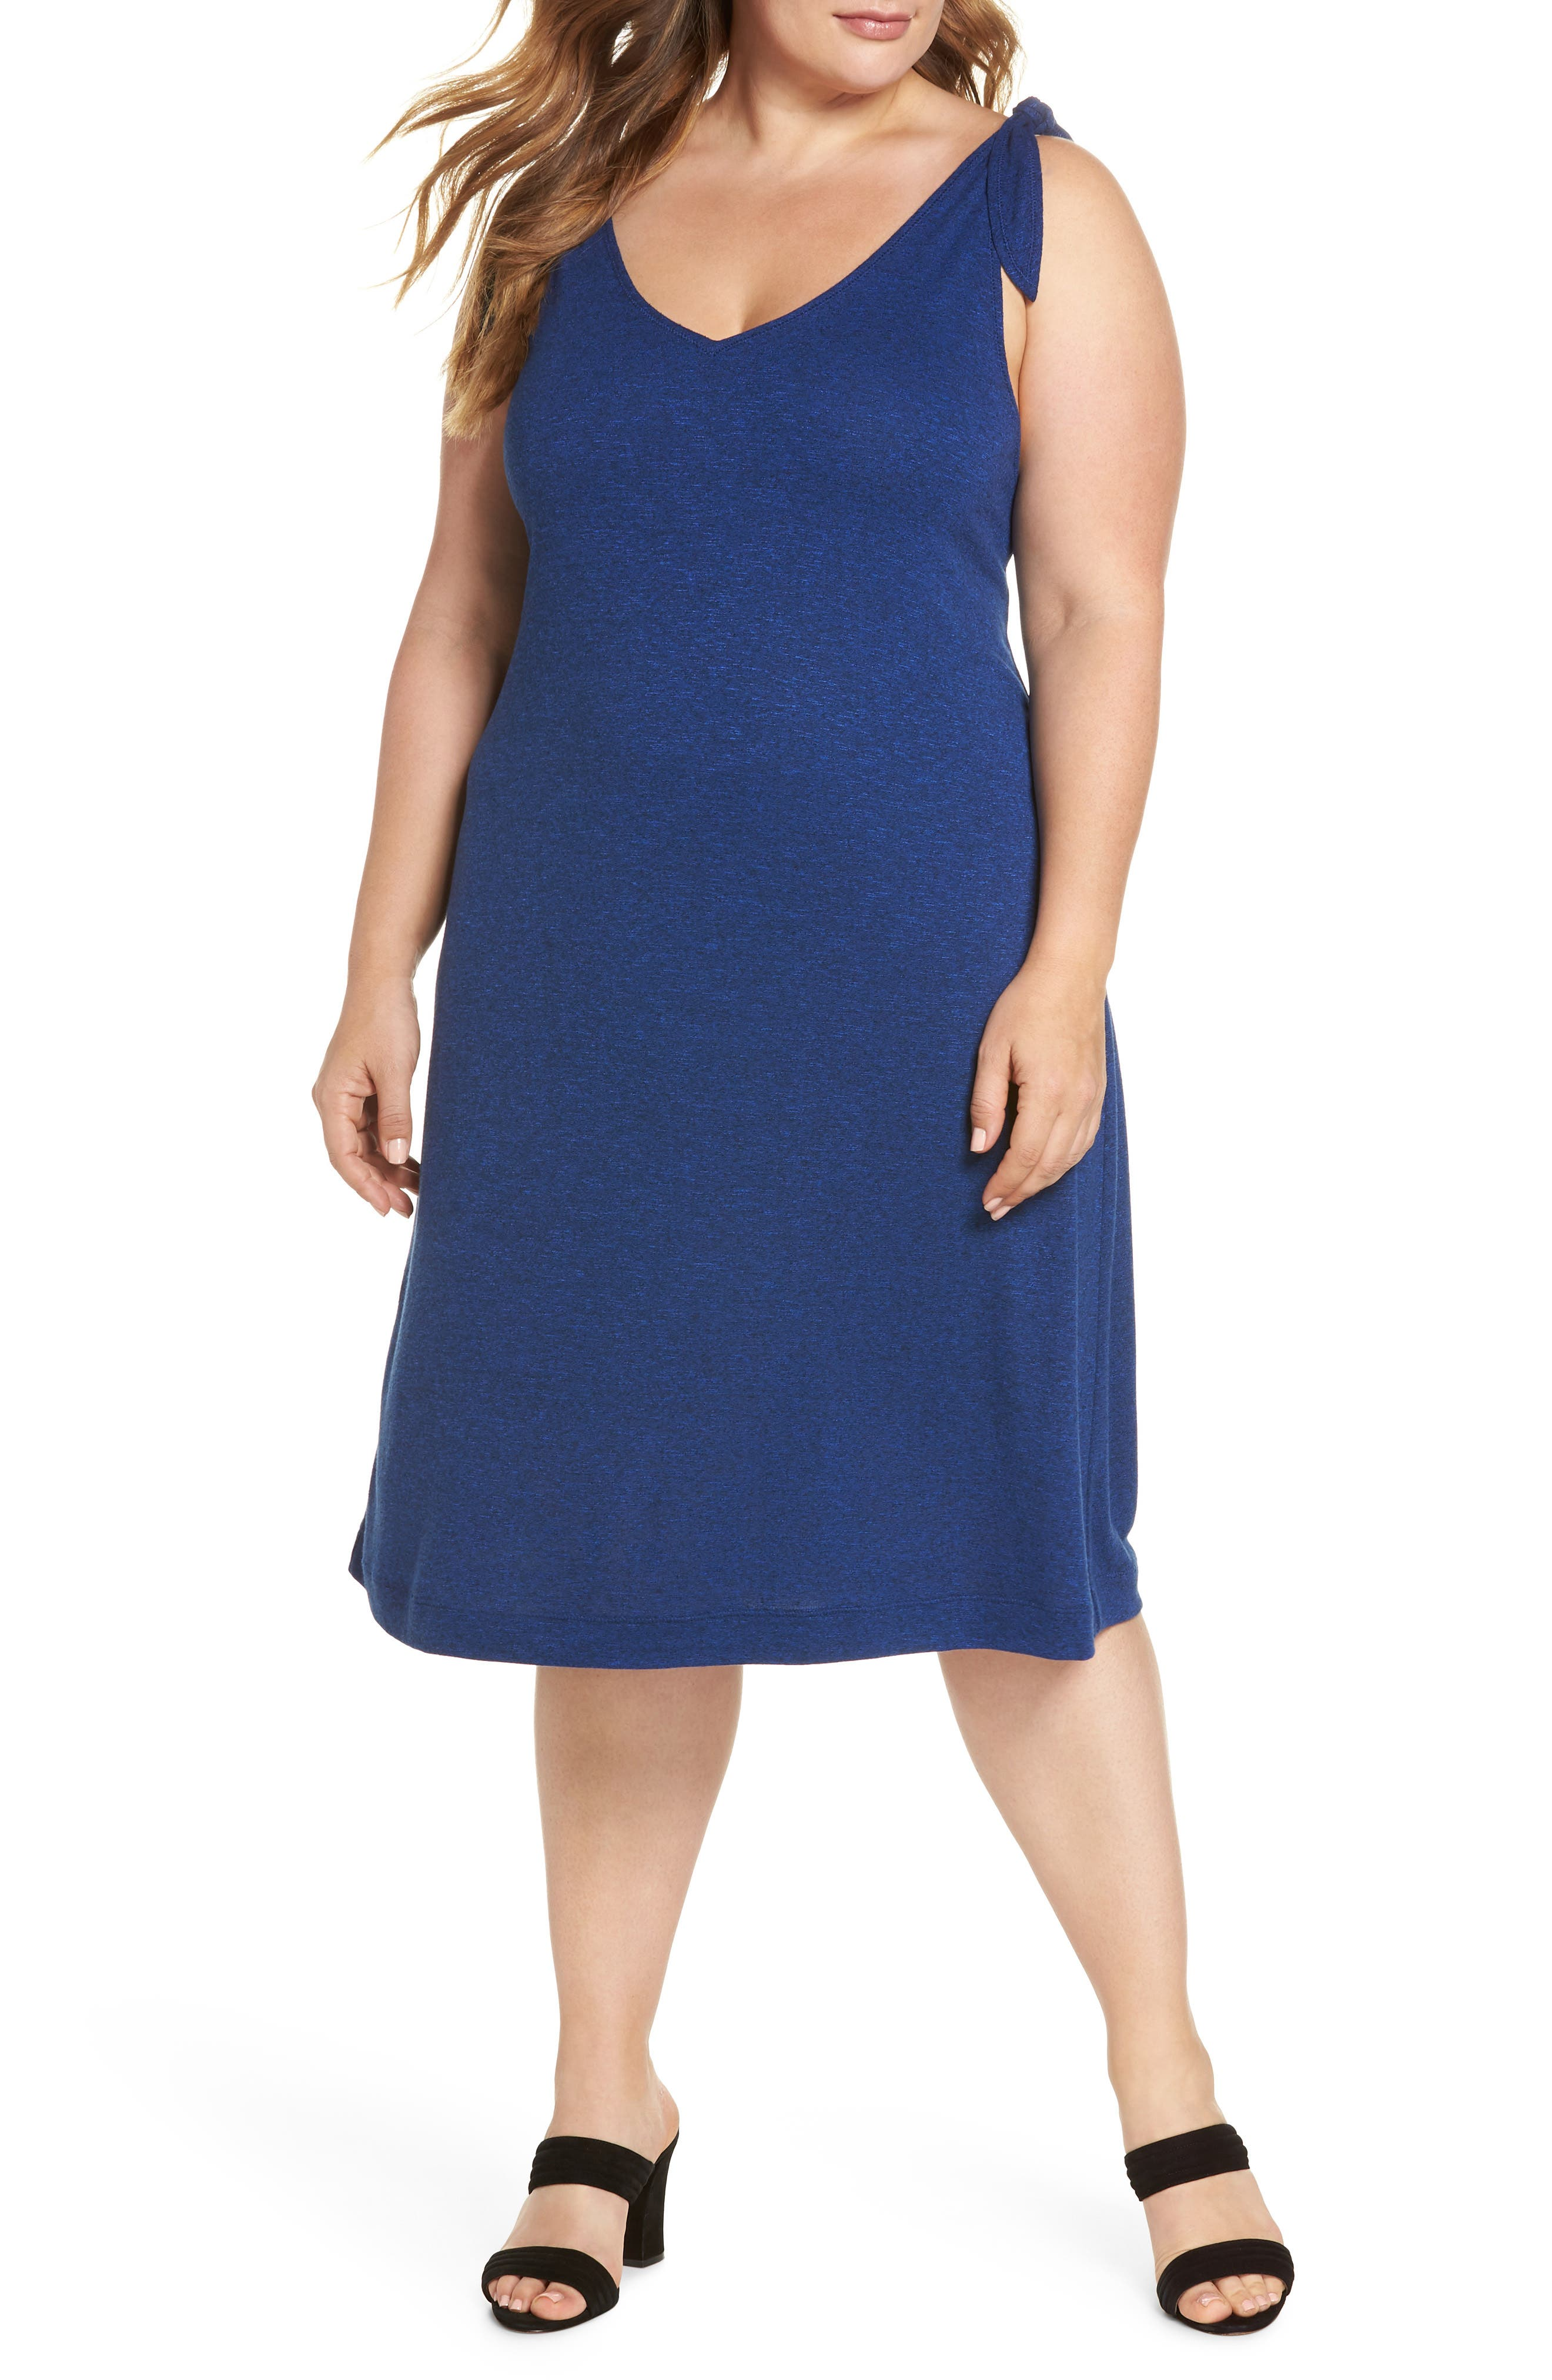 Knot Strap Knit Swing Dress,                         Main,                         color, Cobalt Blue Slub Terry